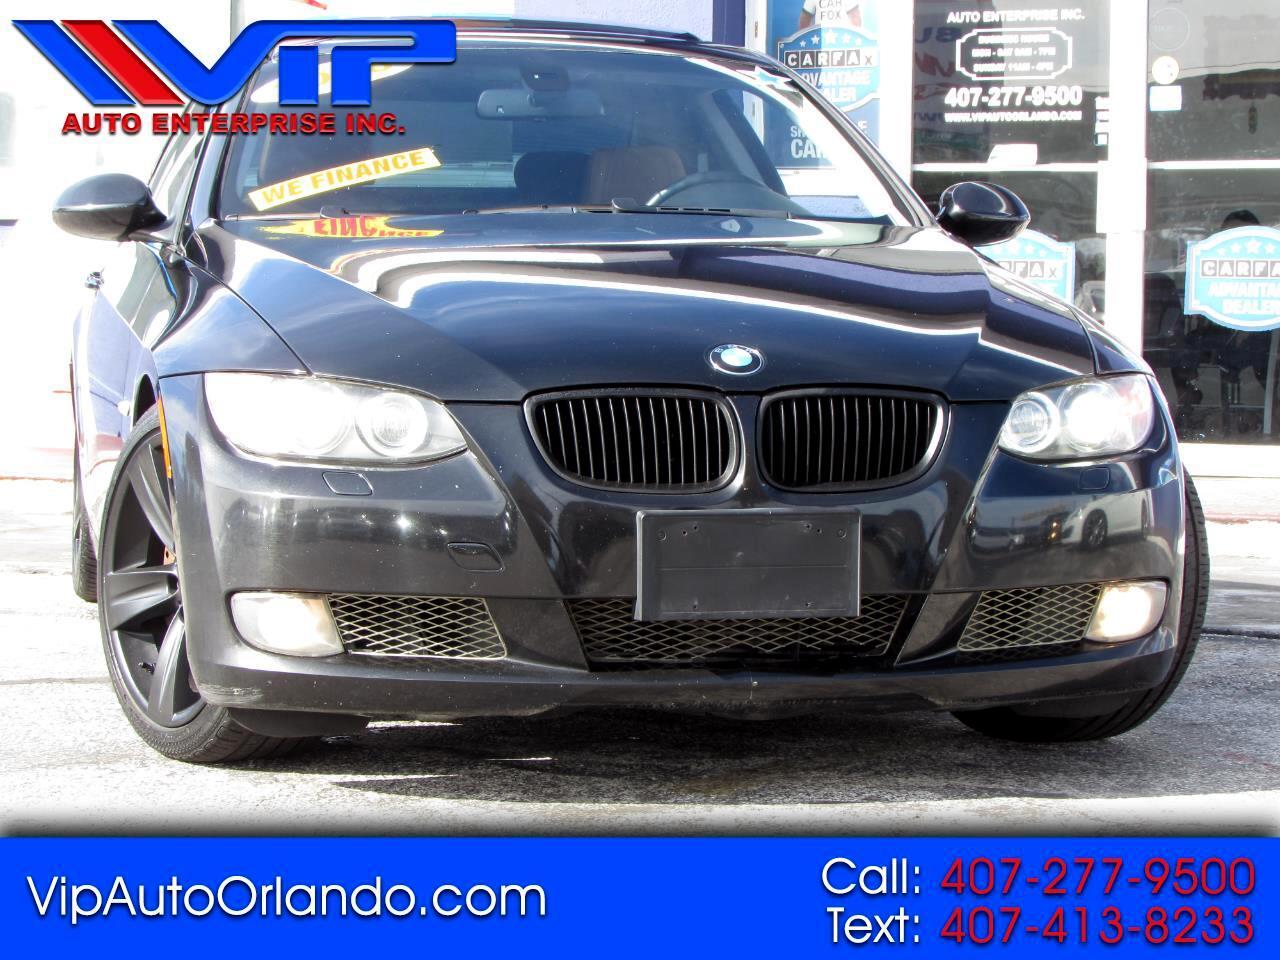 BMW 3 Series 2dr Cpe 335i RWD 2008